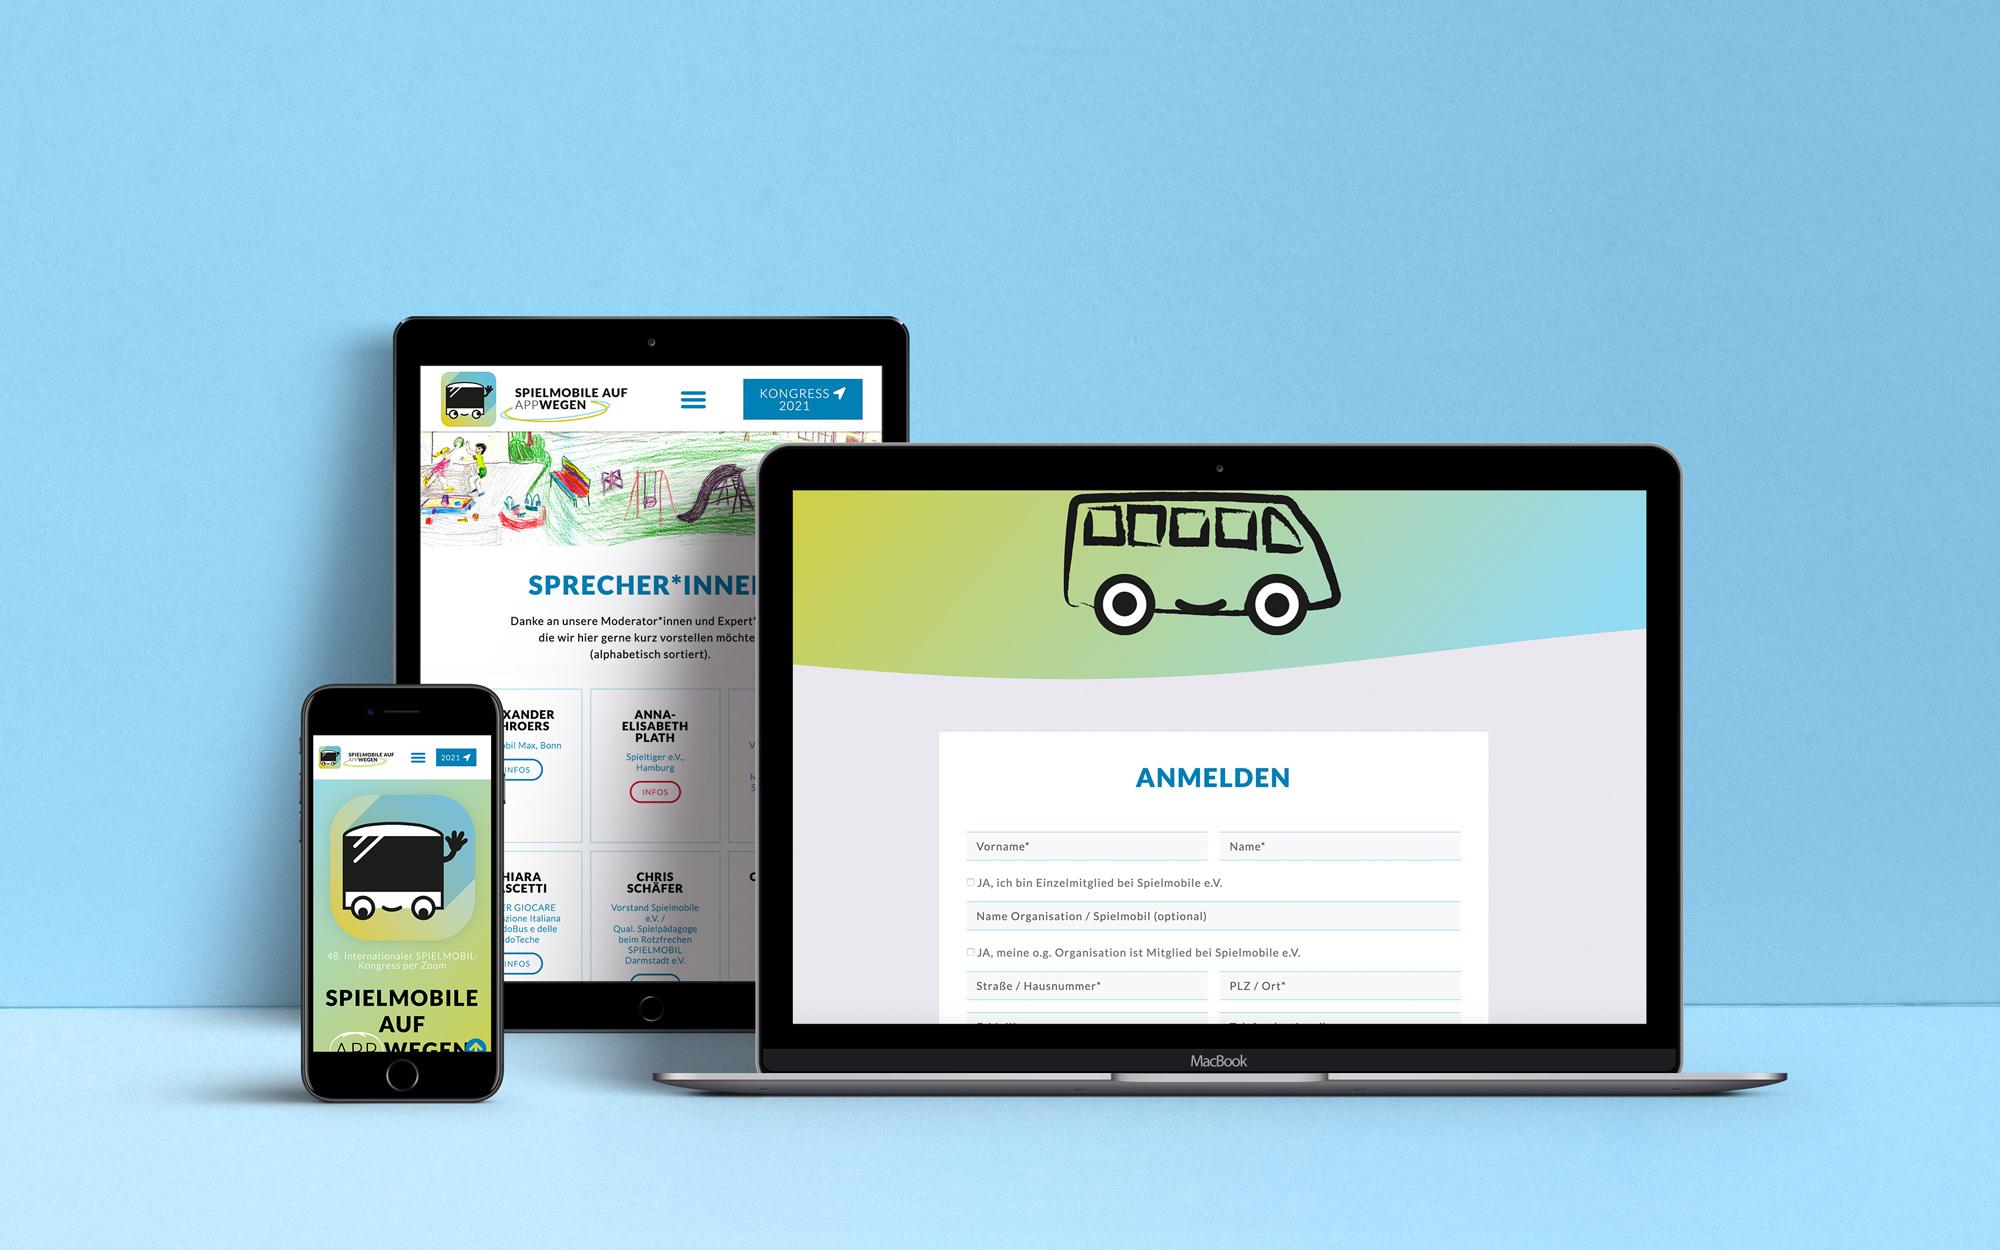 Spielmobile e.V. Online-Kongress 2020 ››› kongress2020.spielmobile.de